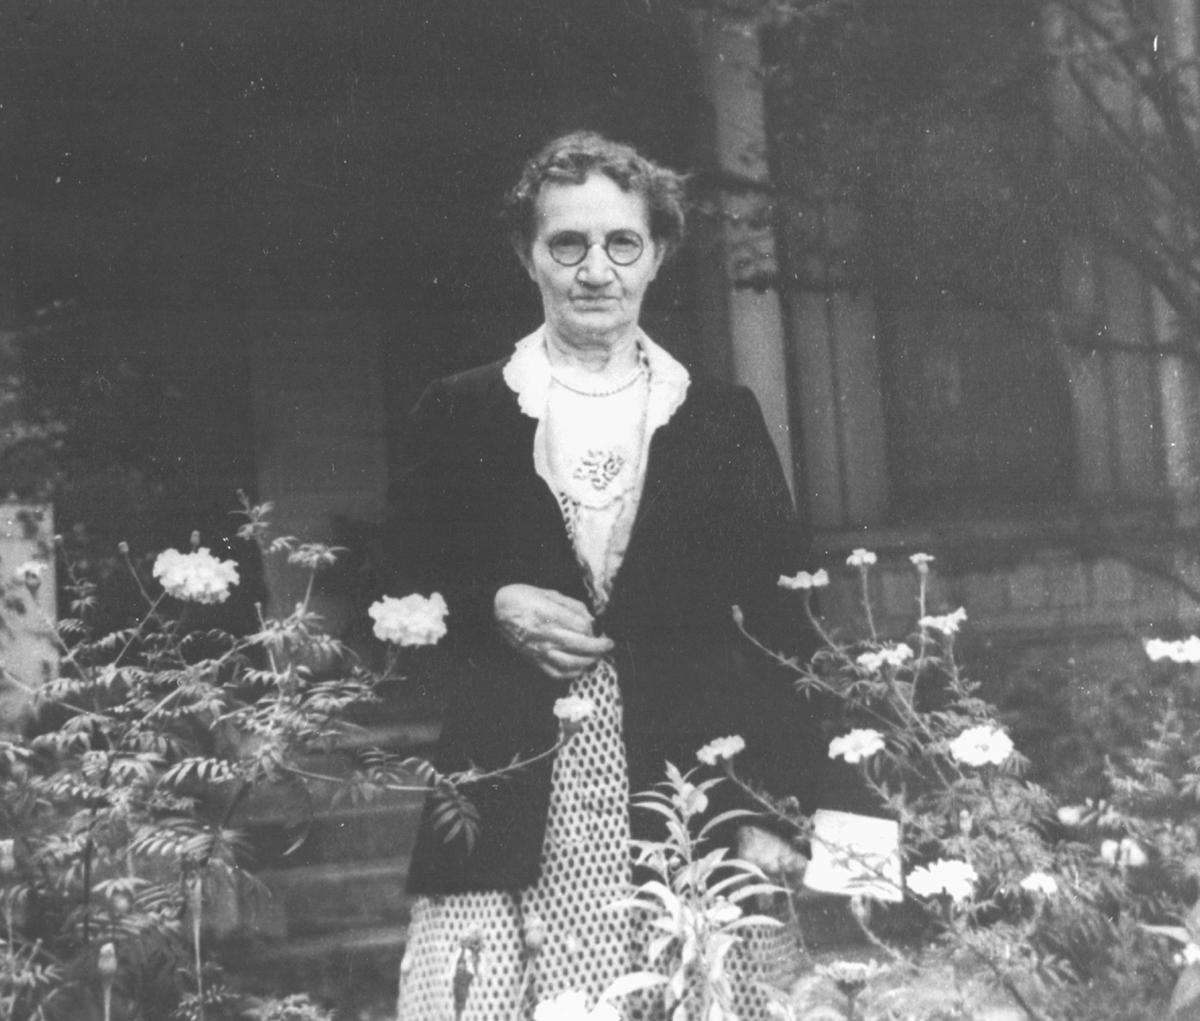 Thomas Wolfe Memorial Celebrates Julia Wolfe's Birthday